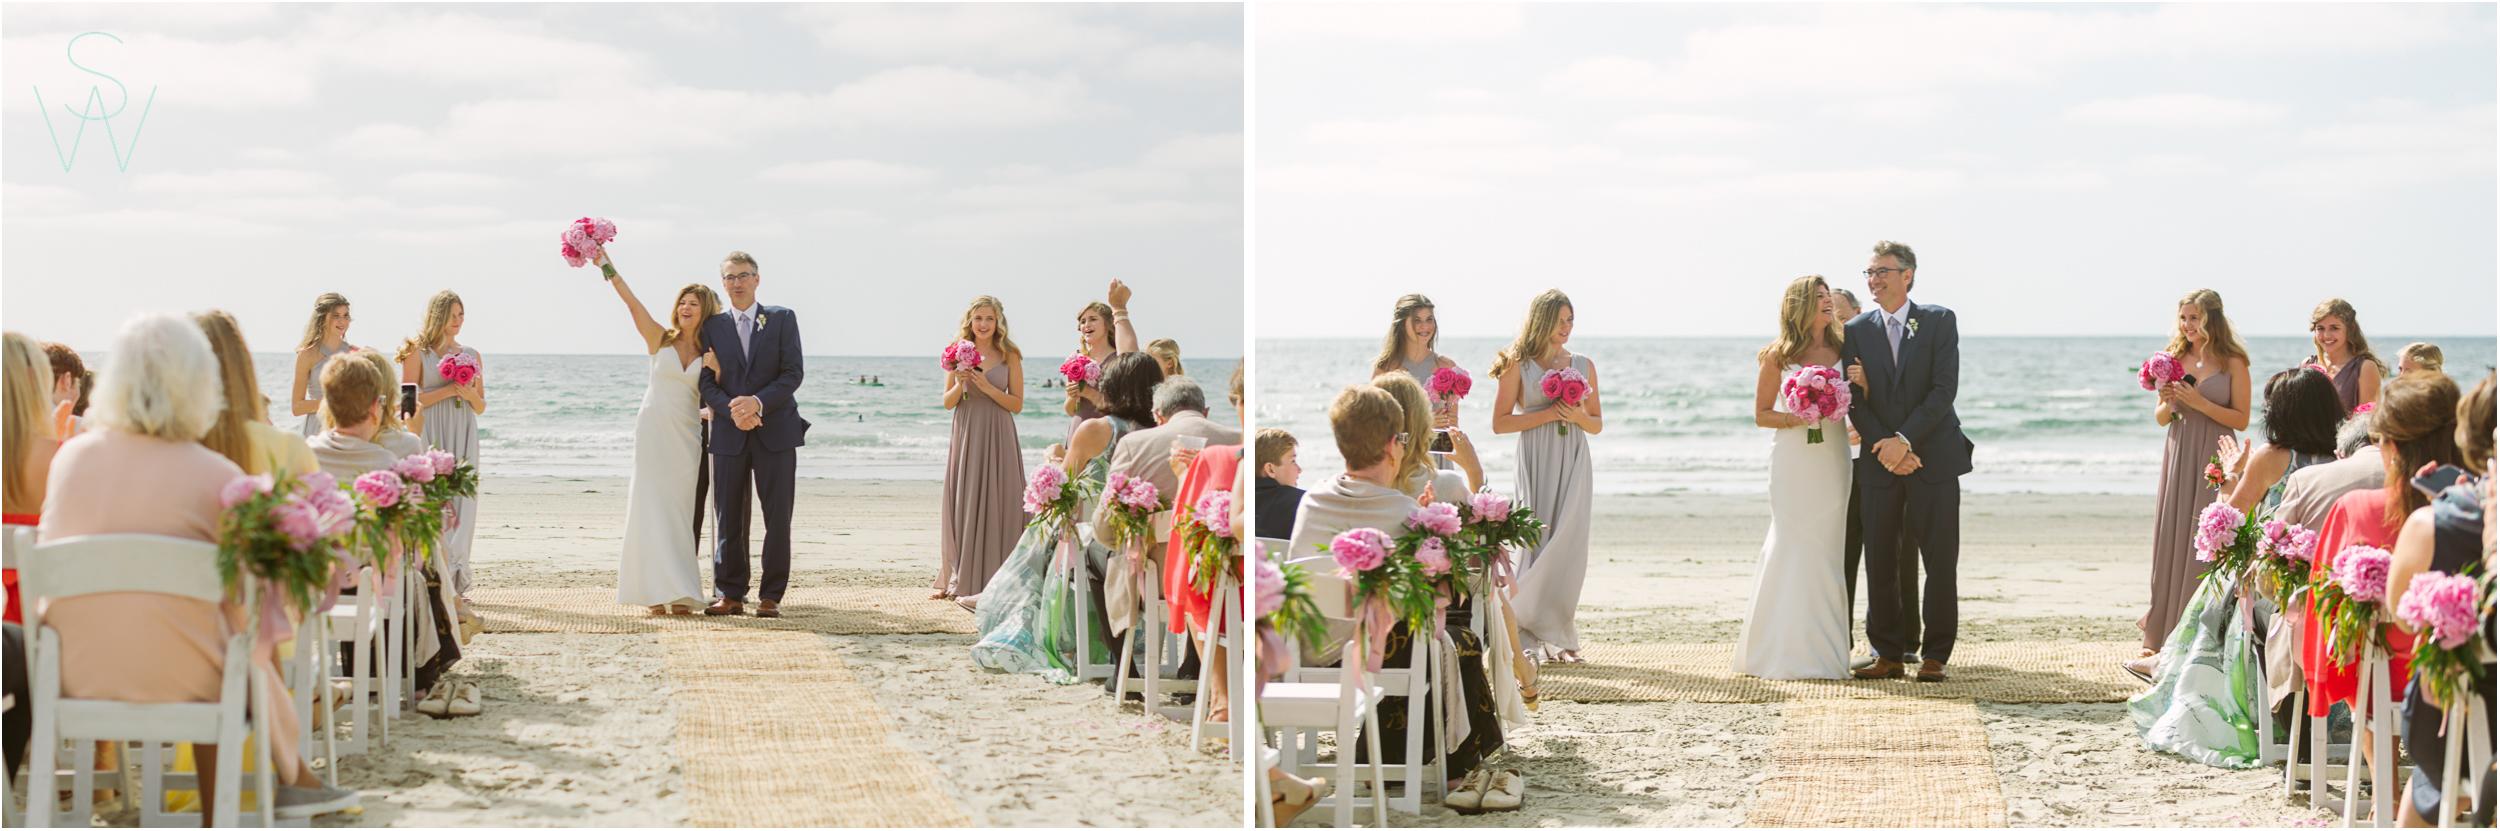 shewanders.wedding.photography.la.jolla-1034.jpg